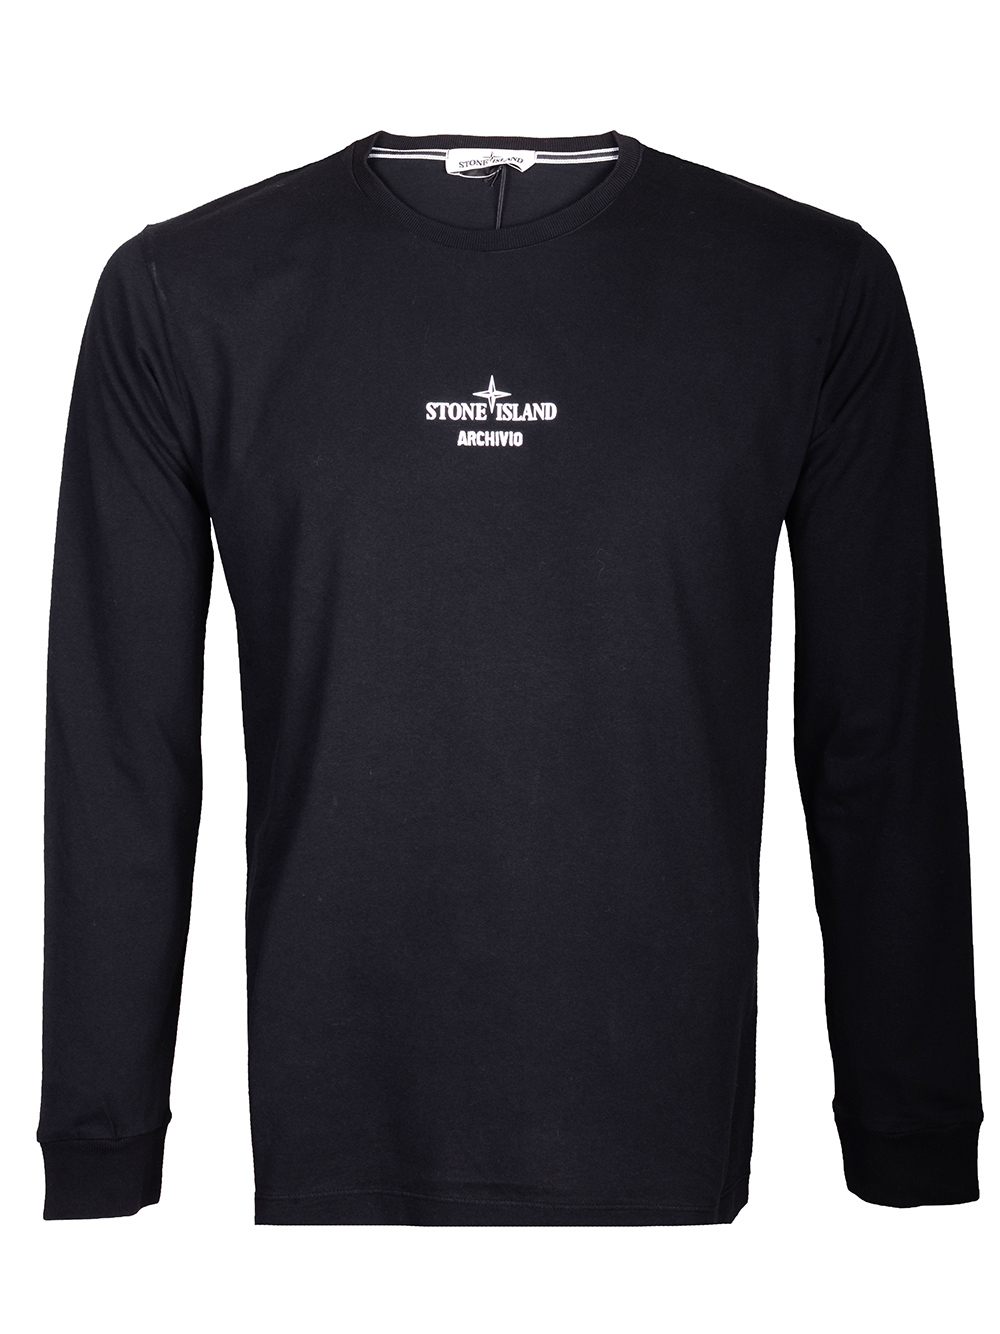 STONE ISLAND Μπλούζα T-Shirt 71152ML91 ΜΑΥΡΟ